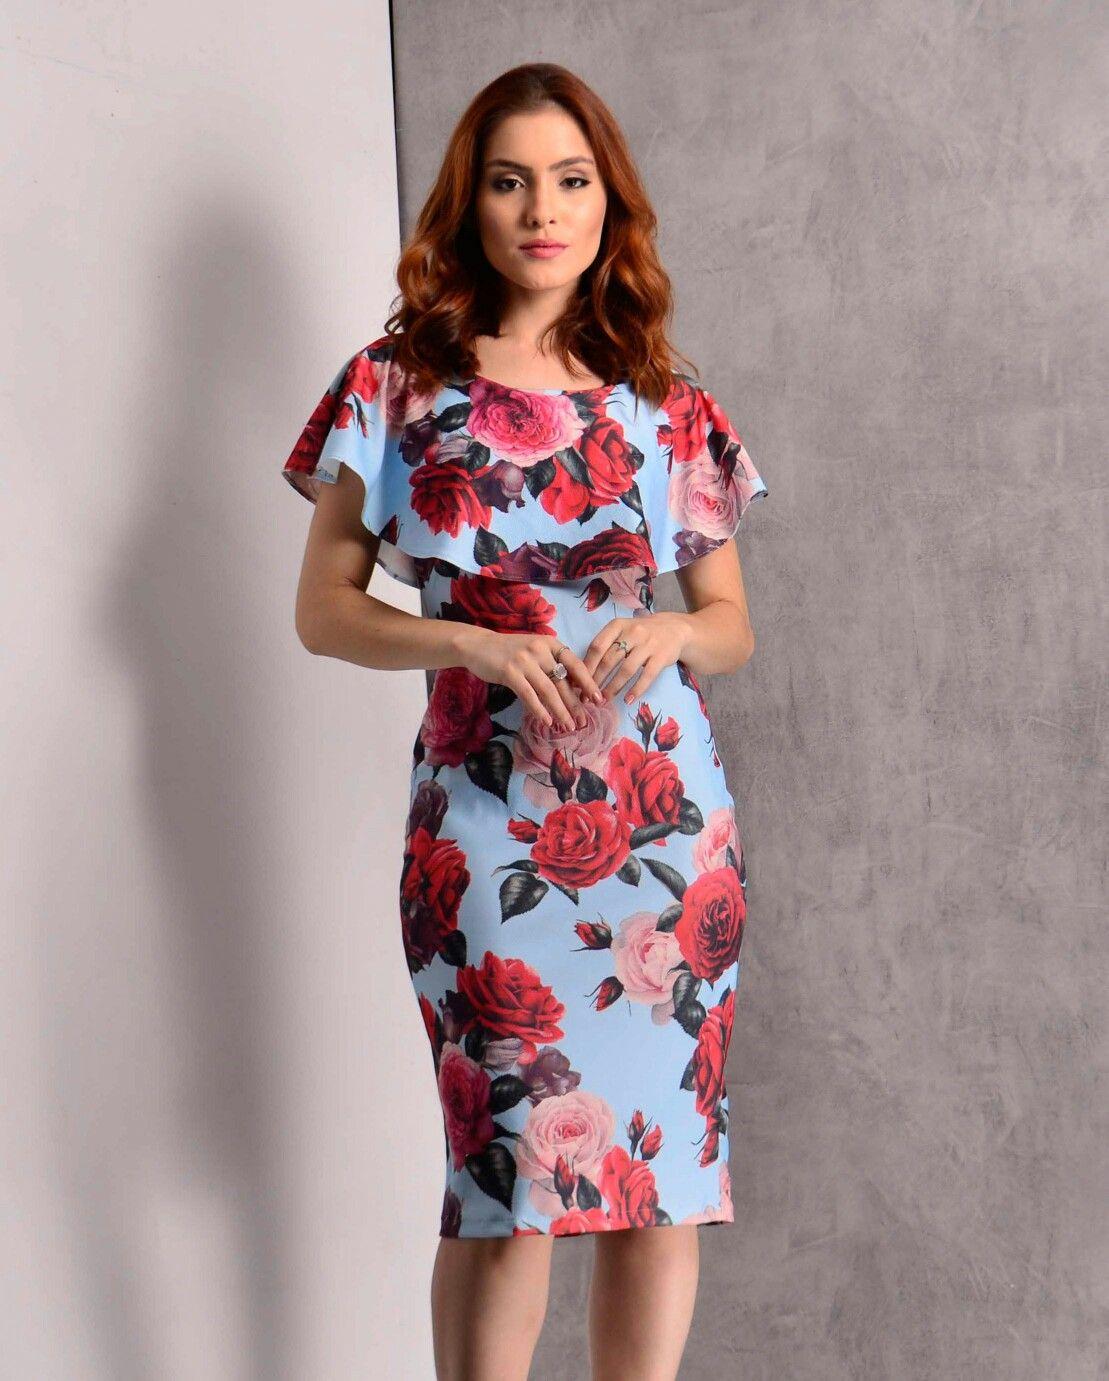 Pin De Ceylis Sevilla En The Favorite Dress En 2019